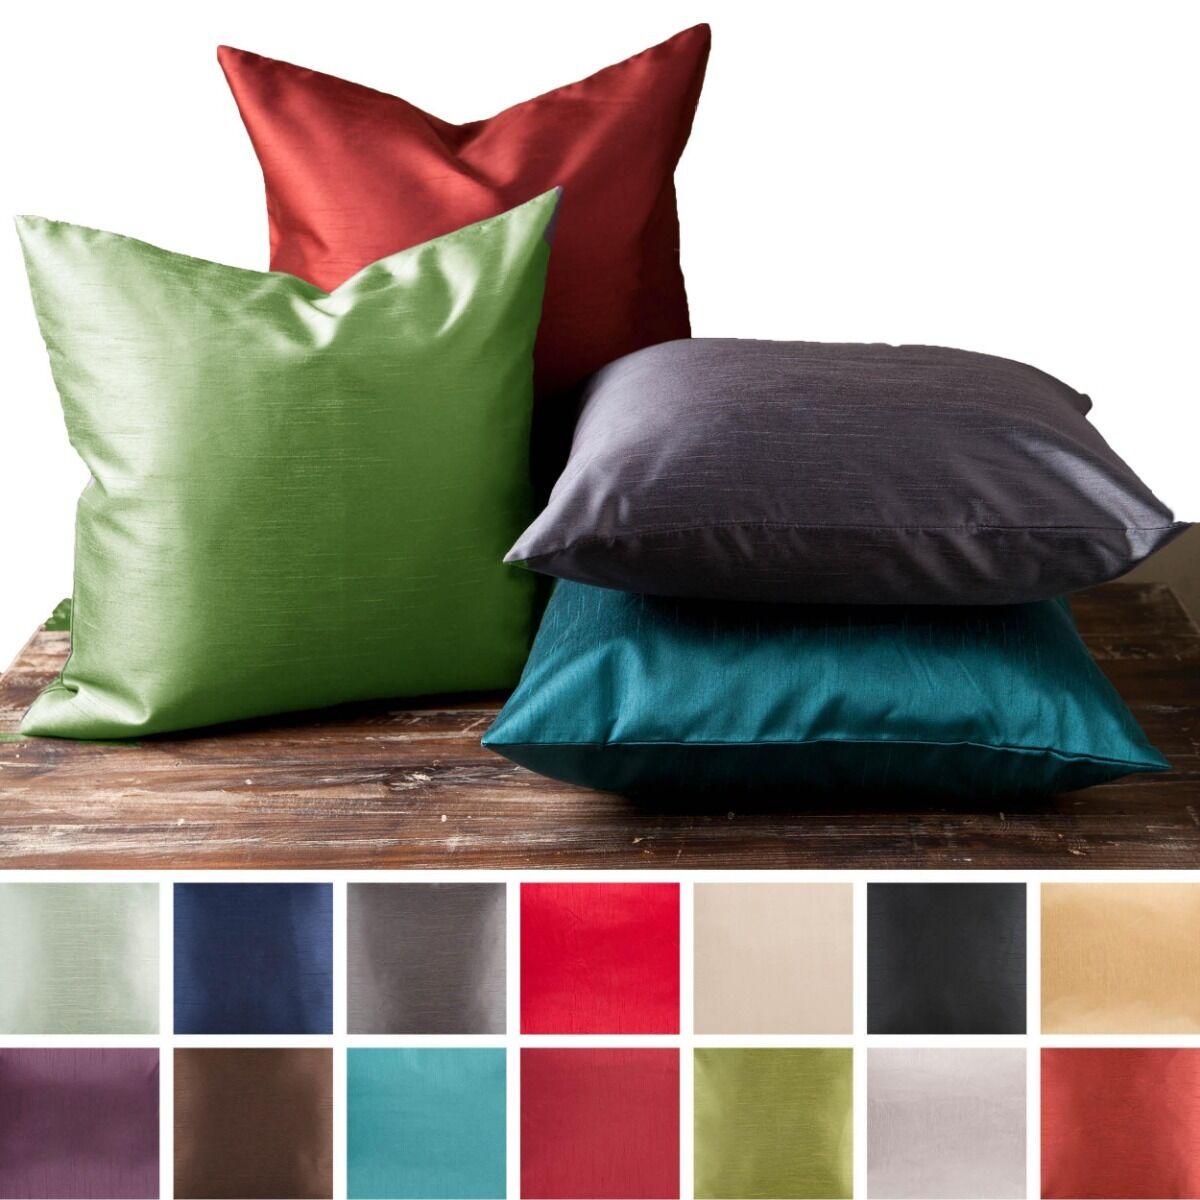 2 Piece Euro Shams Cover Case Decorative Pillow Zippered Clo